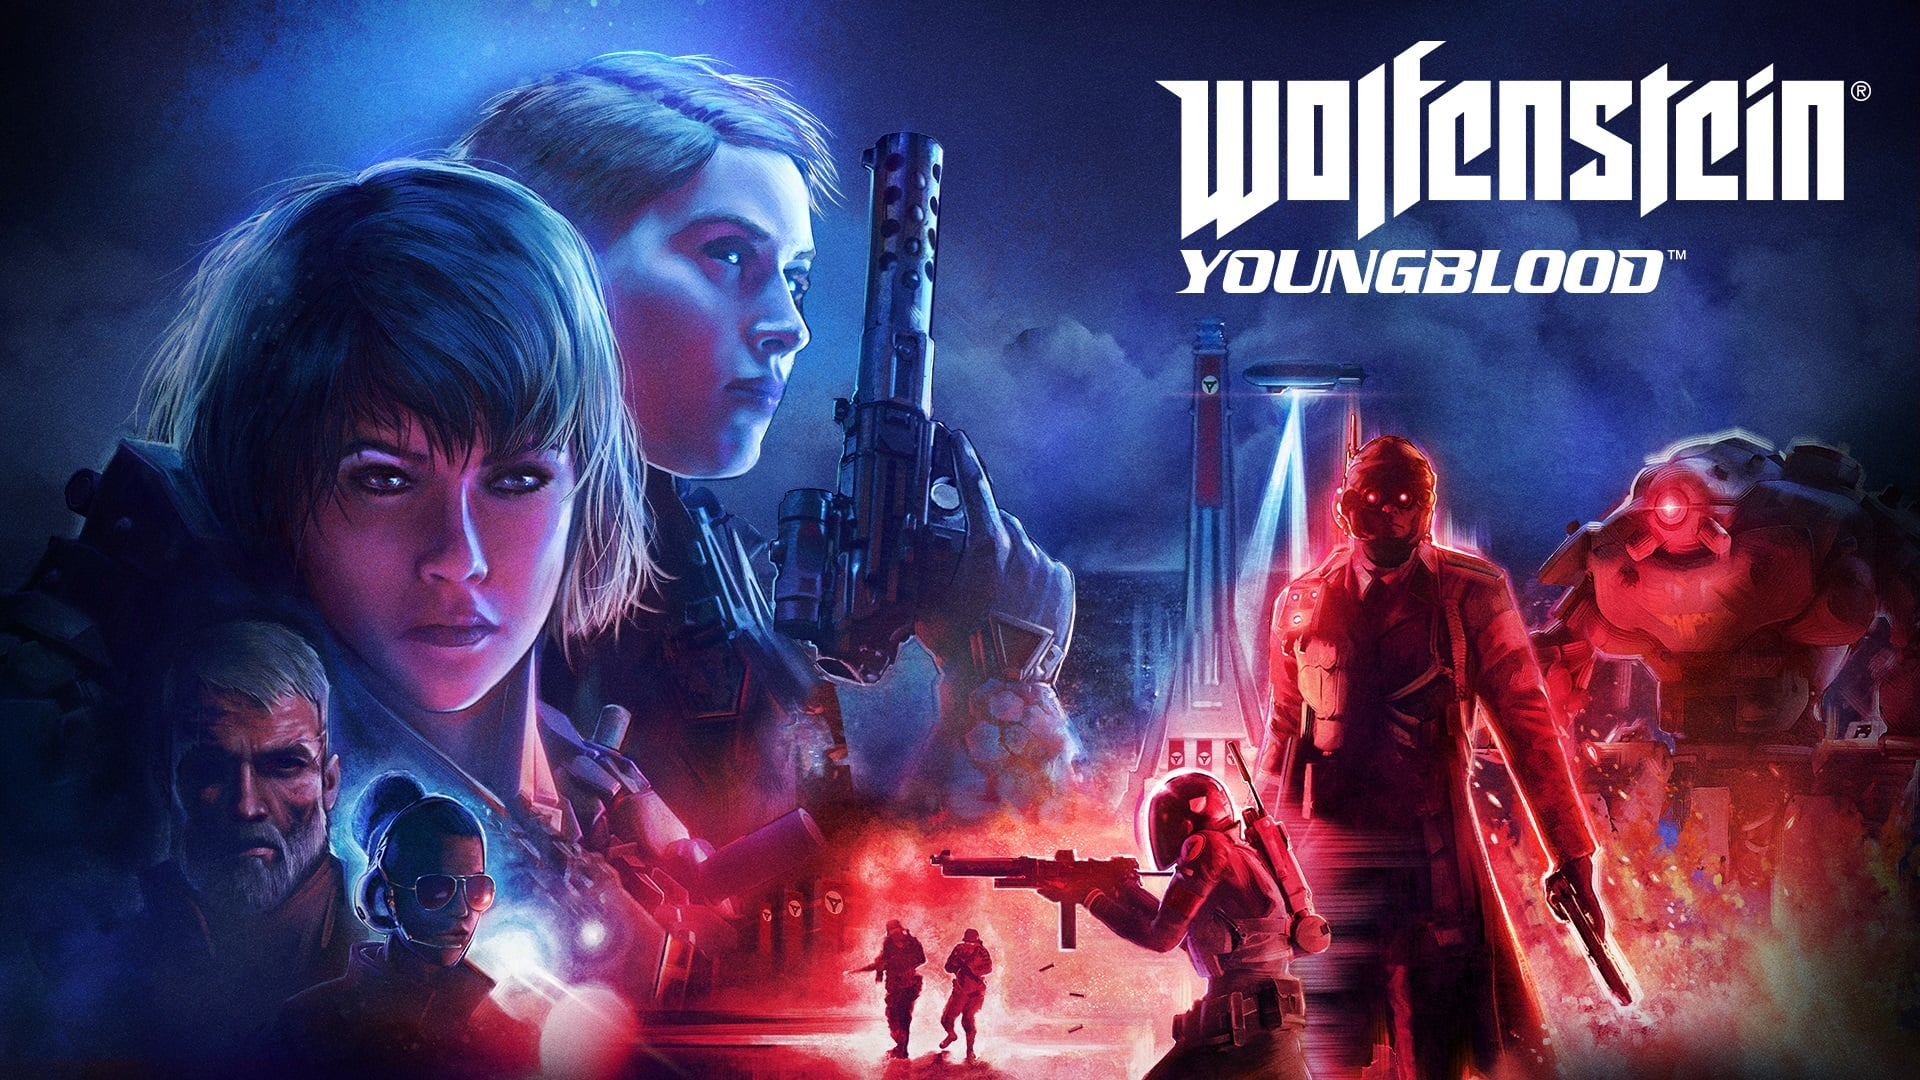 Wolfenstein Youngblood Wallpaper HD